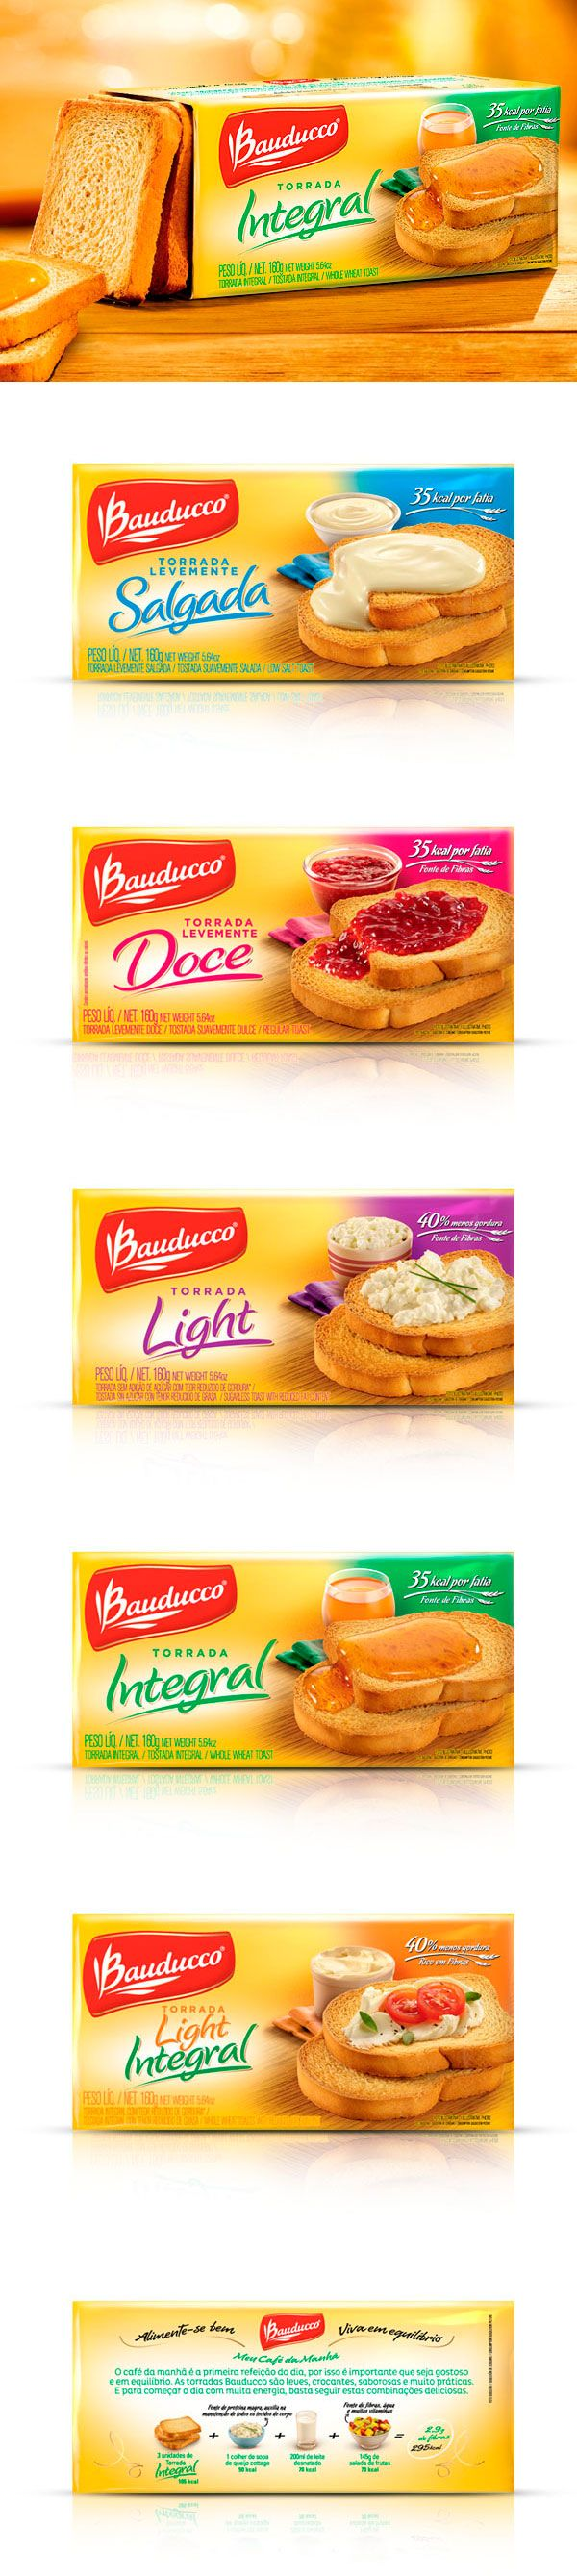 Bauducco Toast Packaging by Design Absoluto [Brazil] www.designabsoluto.com.br